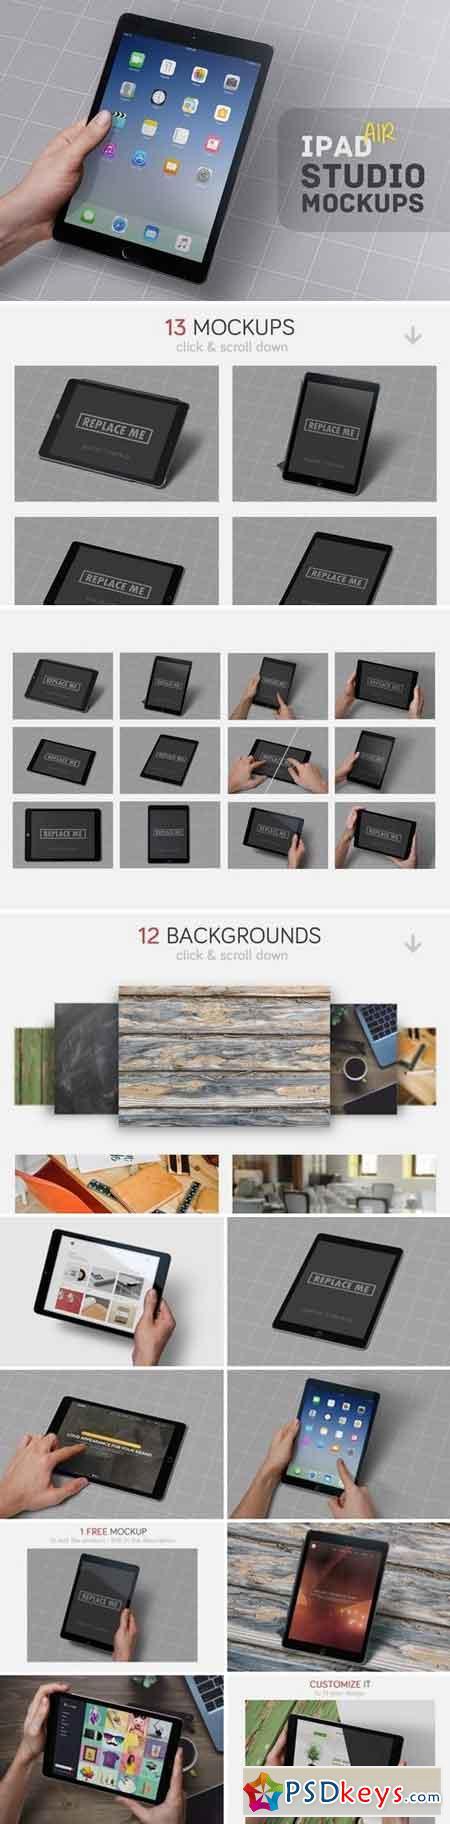 iPad Air Studio Mockups 1306667